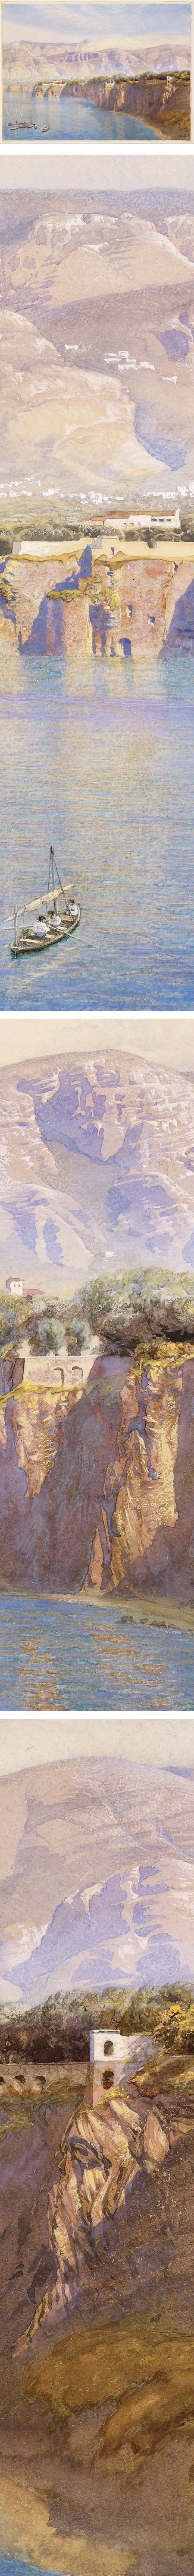 Near Sorrento, John Brett; watercolor and gouache landscape